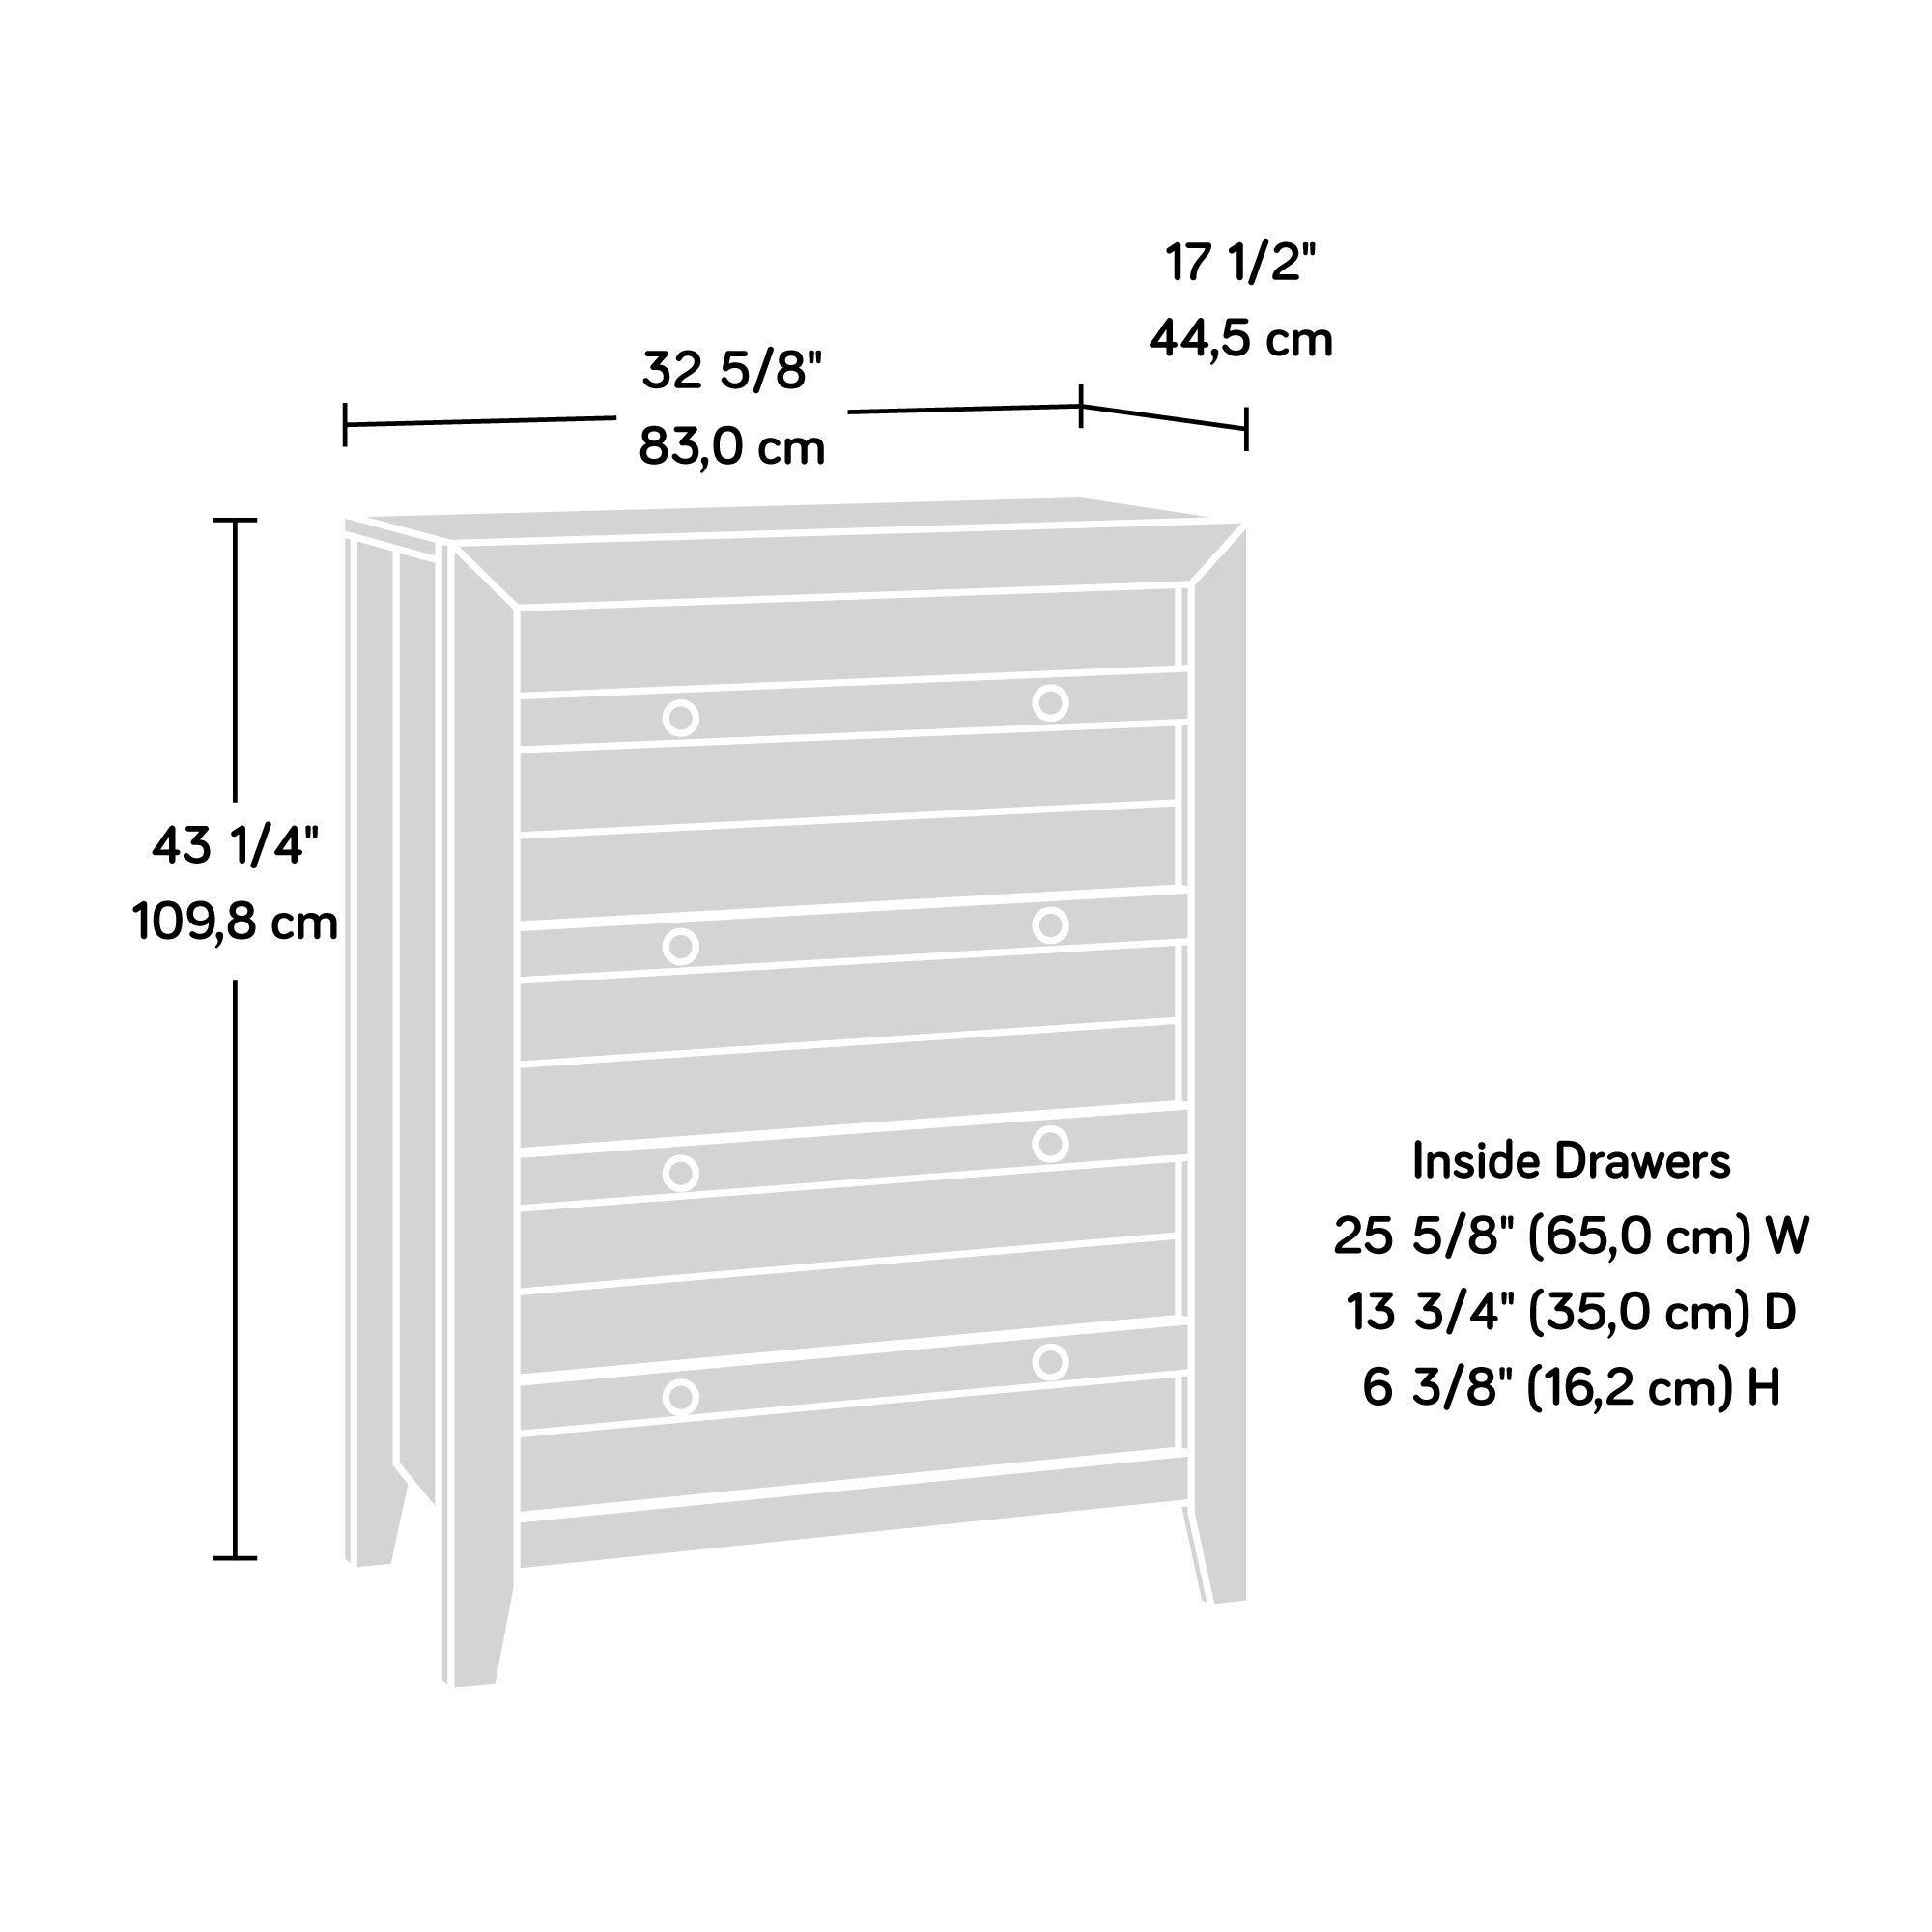 Sauder 418175 Dakota Pass 4-Drawer Chest, L: 32.68'' x W: 17.52'' x H: 43.23'', Craftsman Oak finish by Sauder (Image #5)